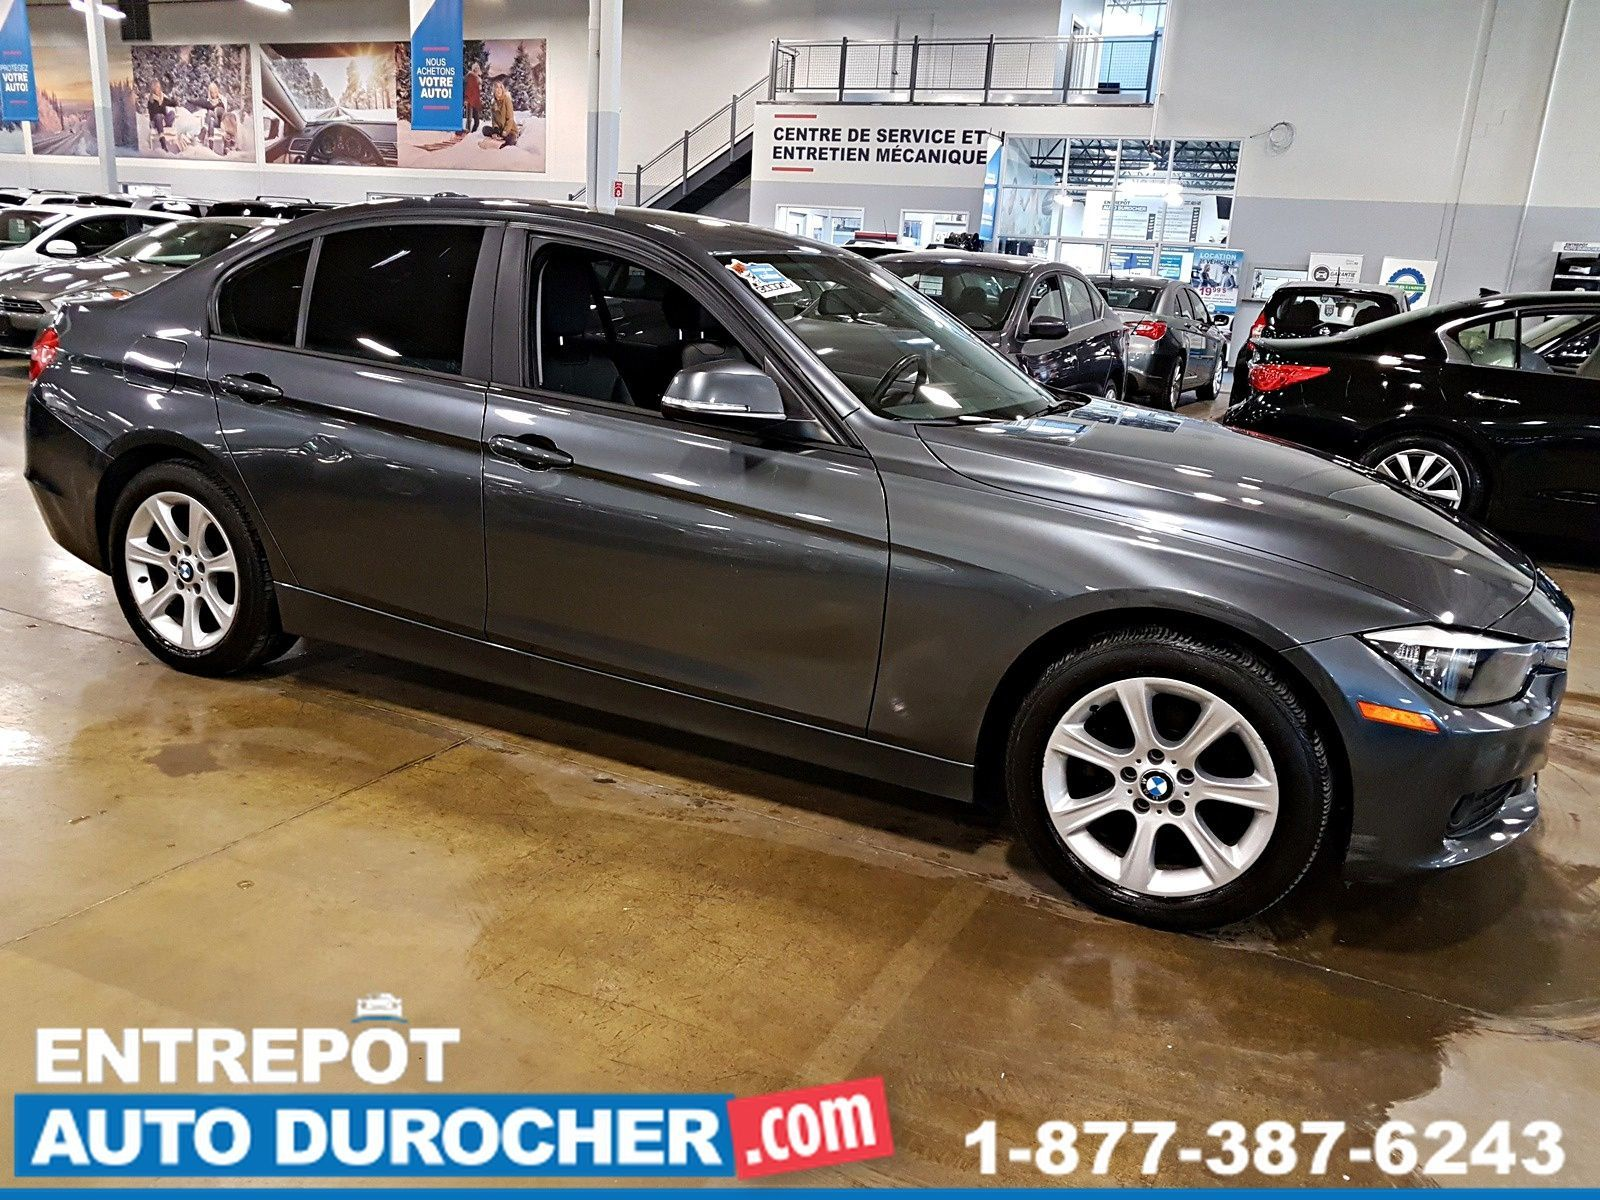 2014 BMW 3 Series 320i xDrive 4X4 Automatique - CUIR - AIR CLIMATISÉ - Heated Seats